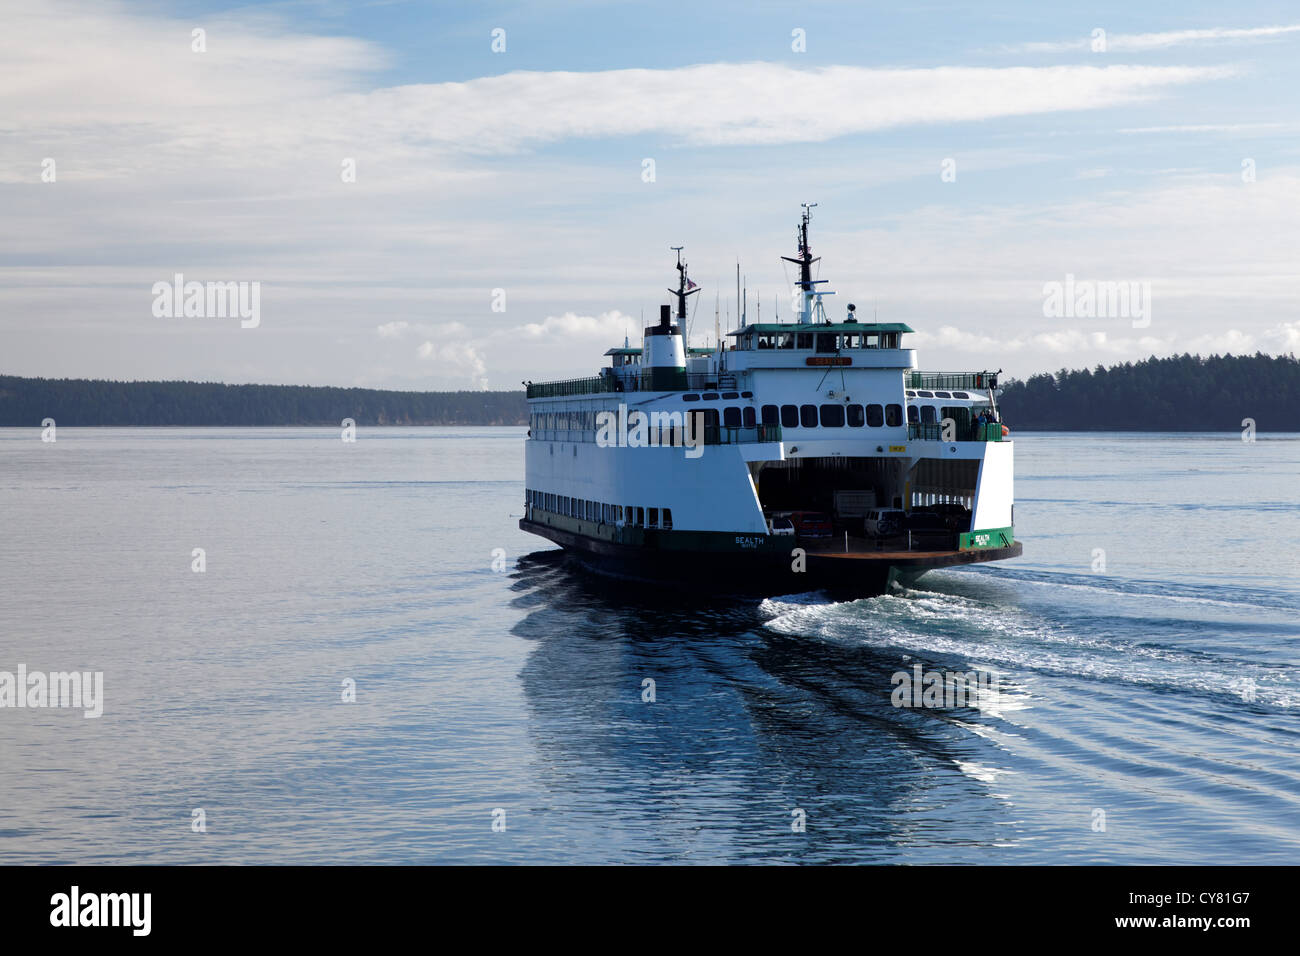 The Washington State Ferry, MV Sealth, cruising through the San Juan Islands, an Juan County, Washington State, - Stock Image